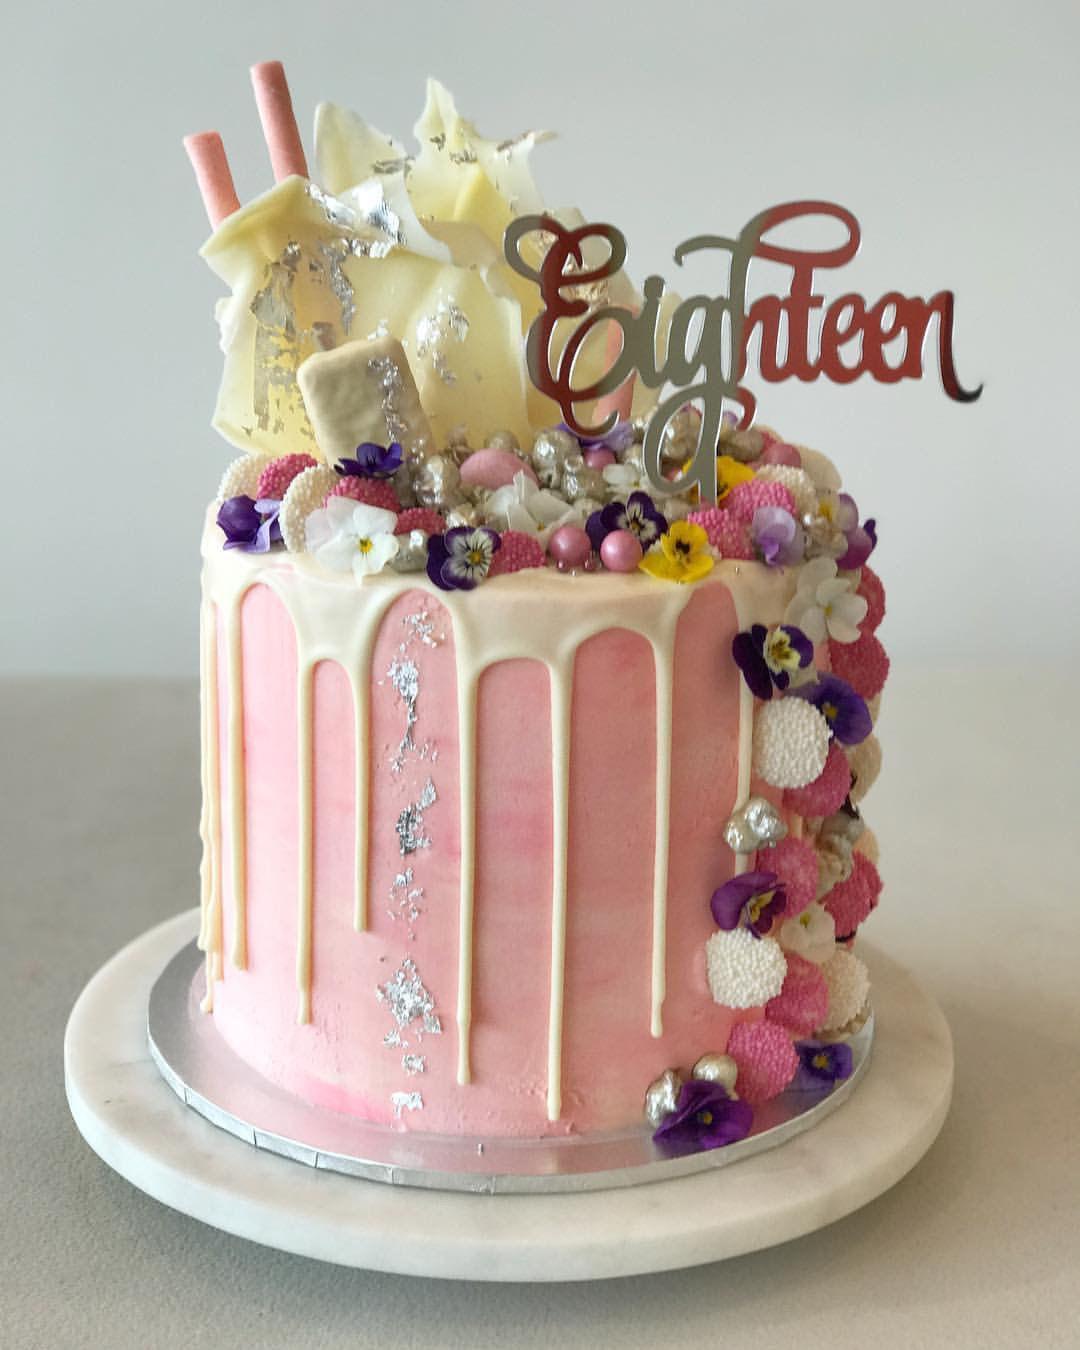 18Th Birthday Gift Ideas For Girl  Top 7 Best 18th Birthday Gift Ideas Ferns N Petals